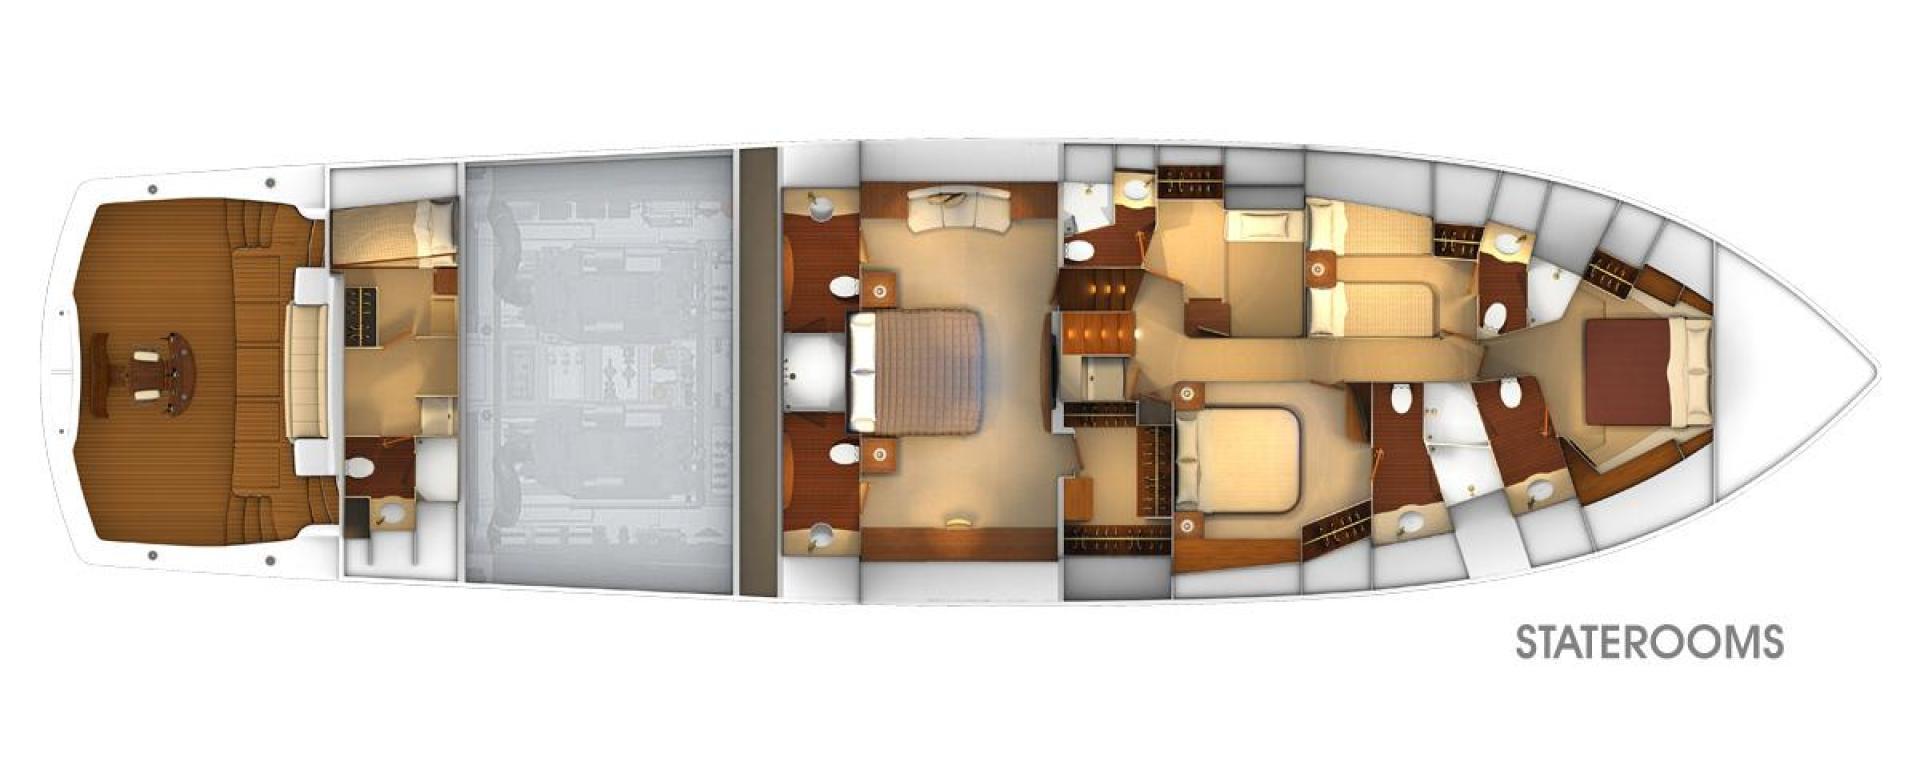 Viking 92 - Stateroom Layout